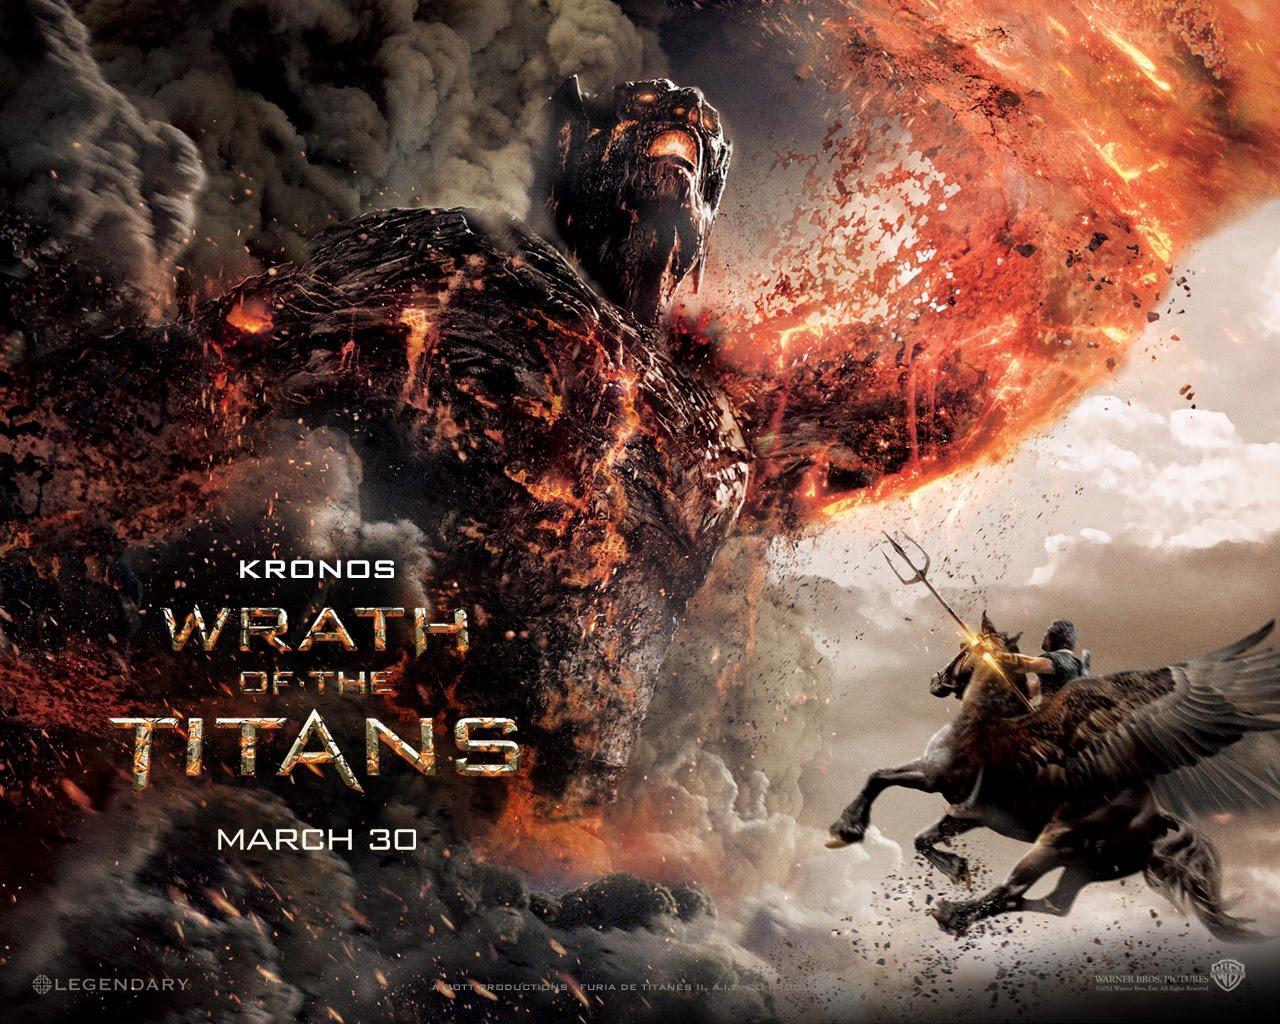 furia de titanes 2 wallpapers wrath of the titans